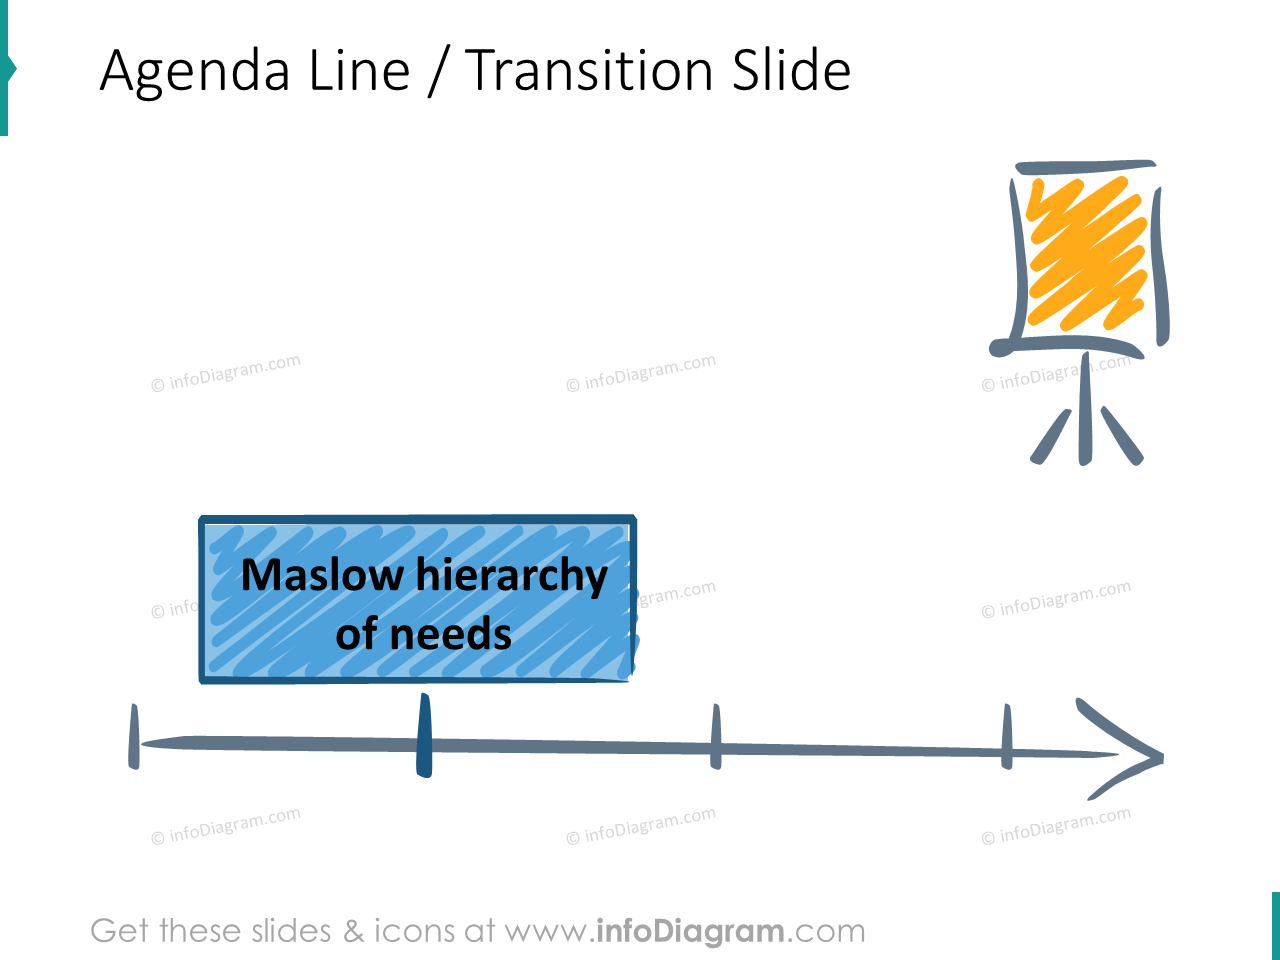 motivation training agenda transition slide maslow icons ppt clipart